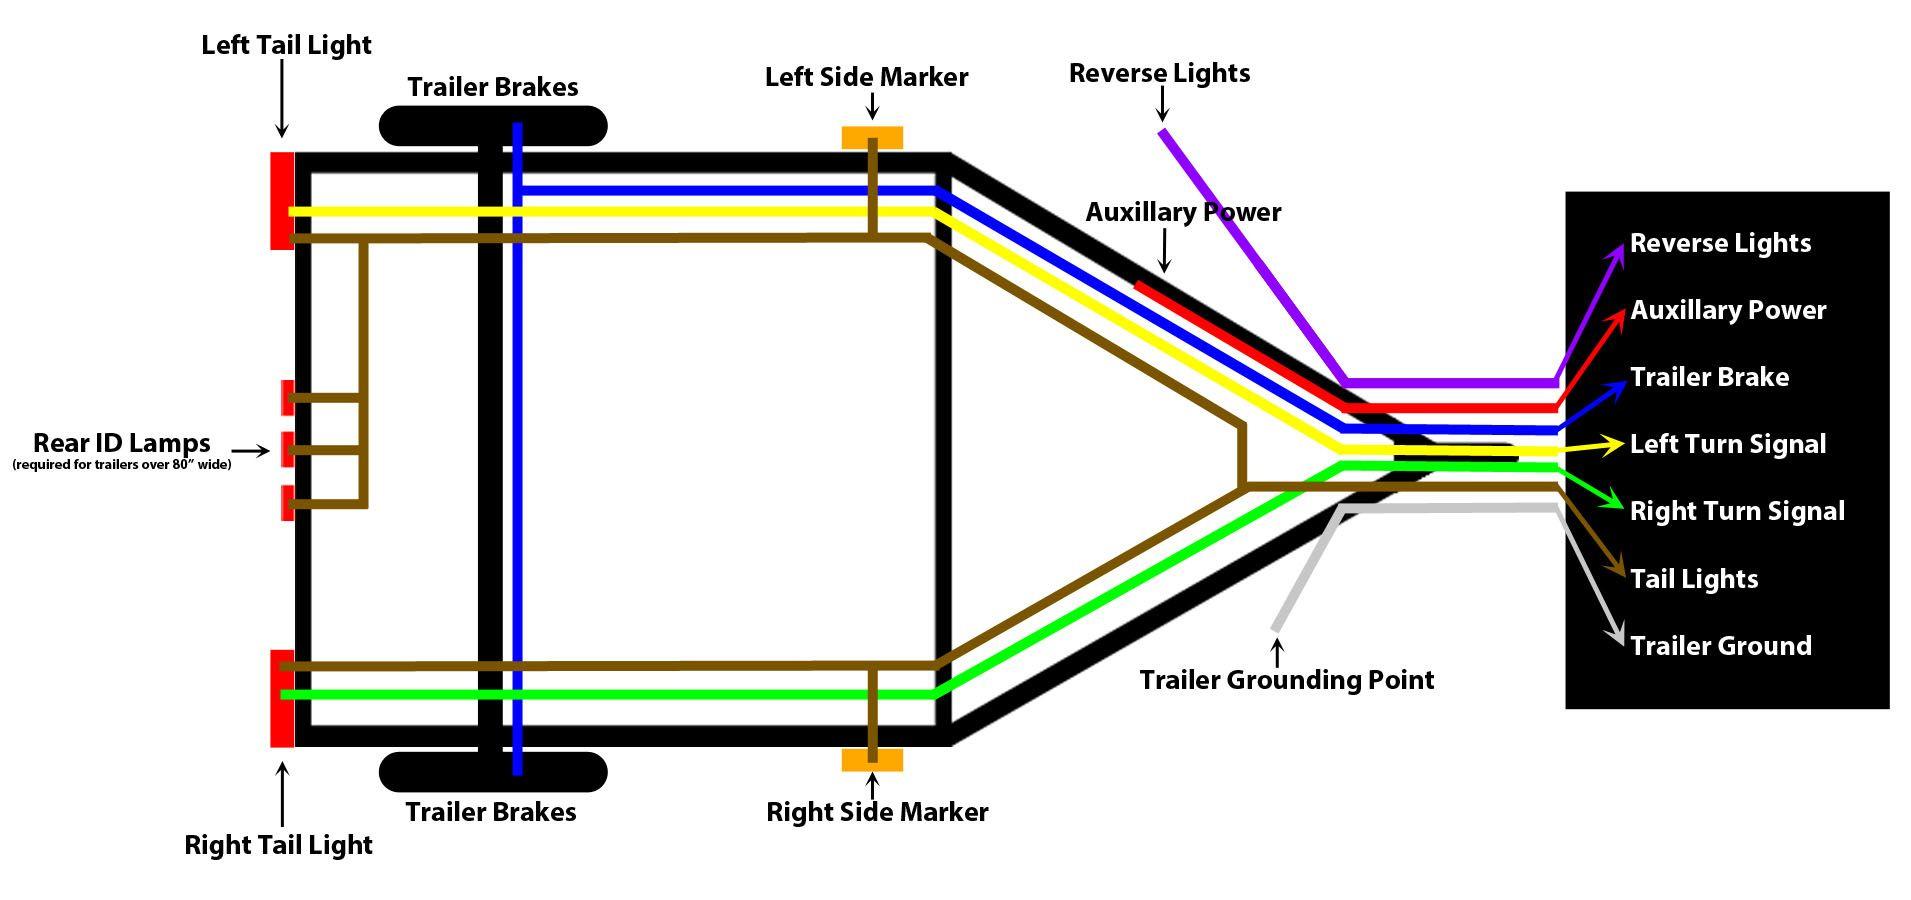 Rv Trailer Wiring Diagram | Wiring Diagram - Rv Trailer Wiring Diagram